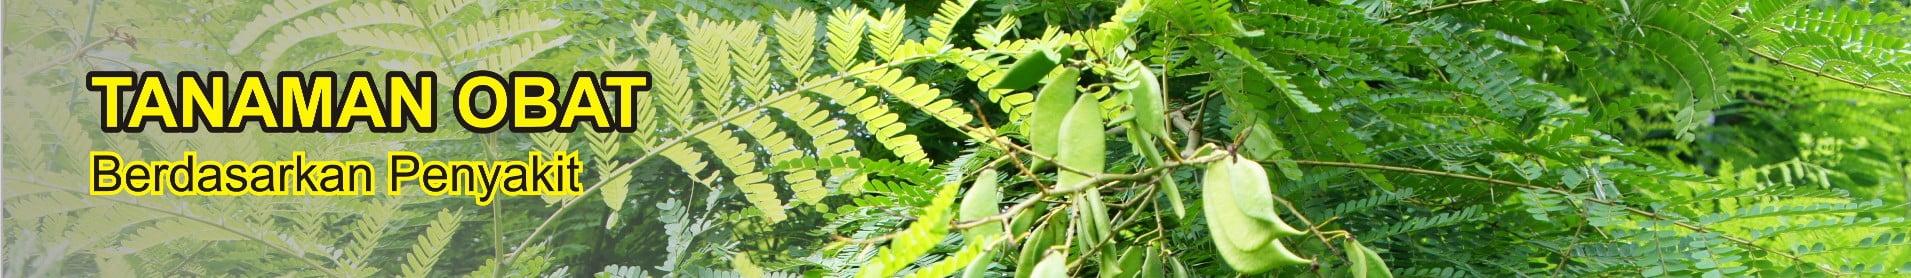 tanaman obat berdasarkan penyakit - tanaman obat taman husada